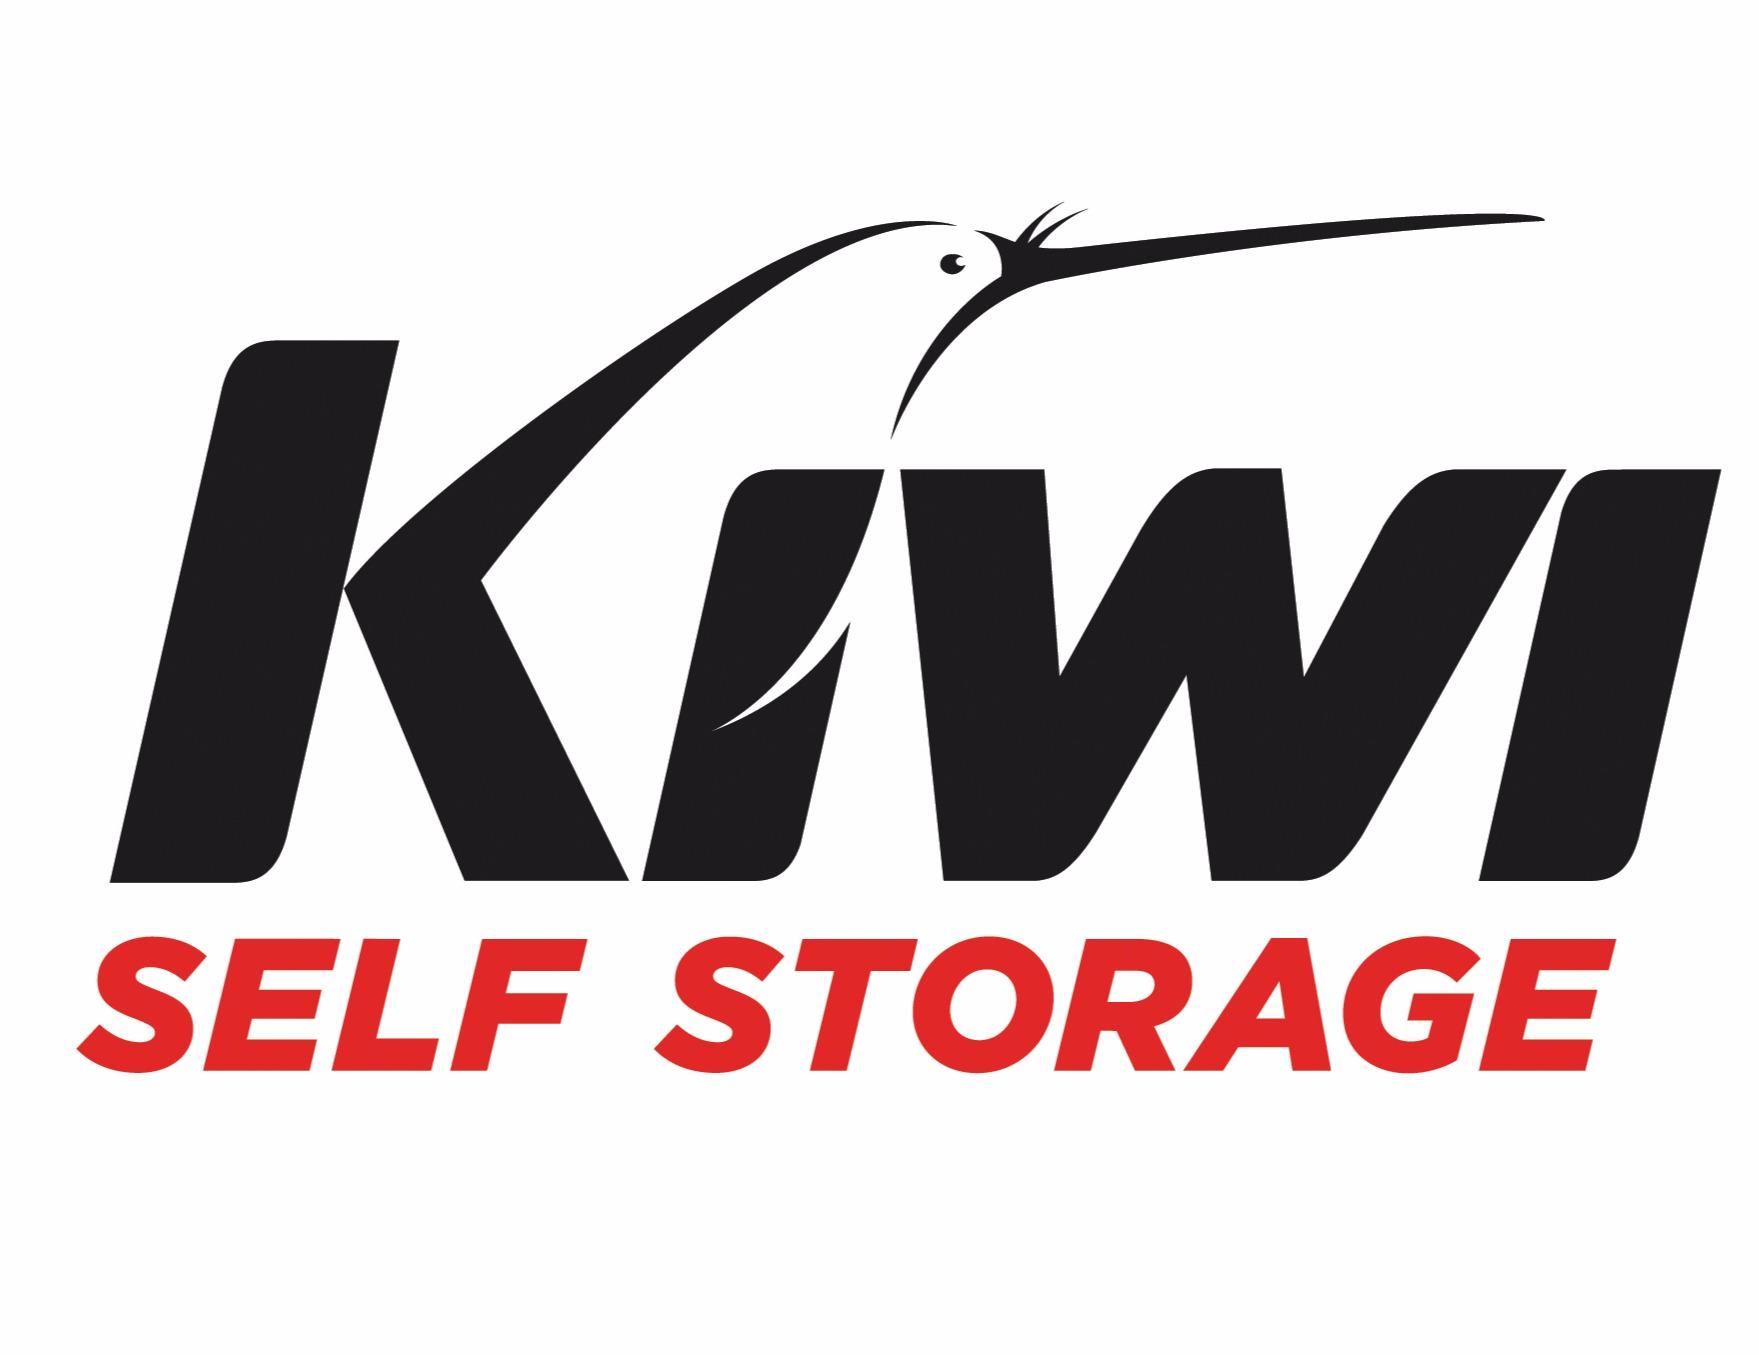 Kiwi Self Storage